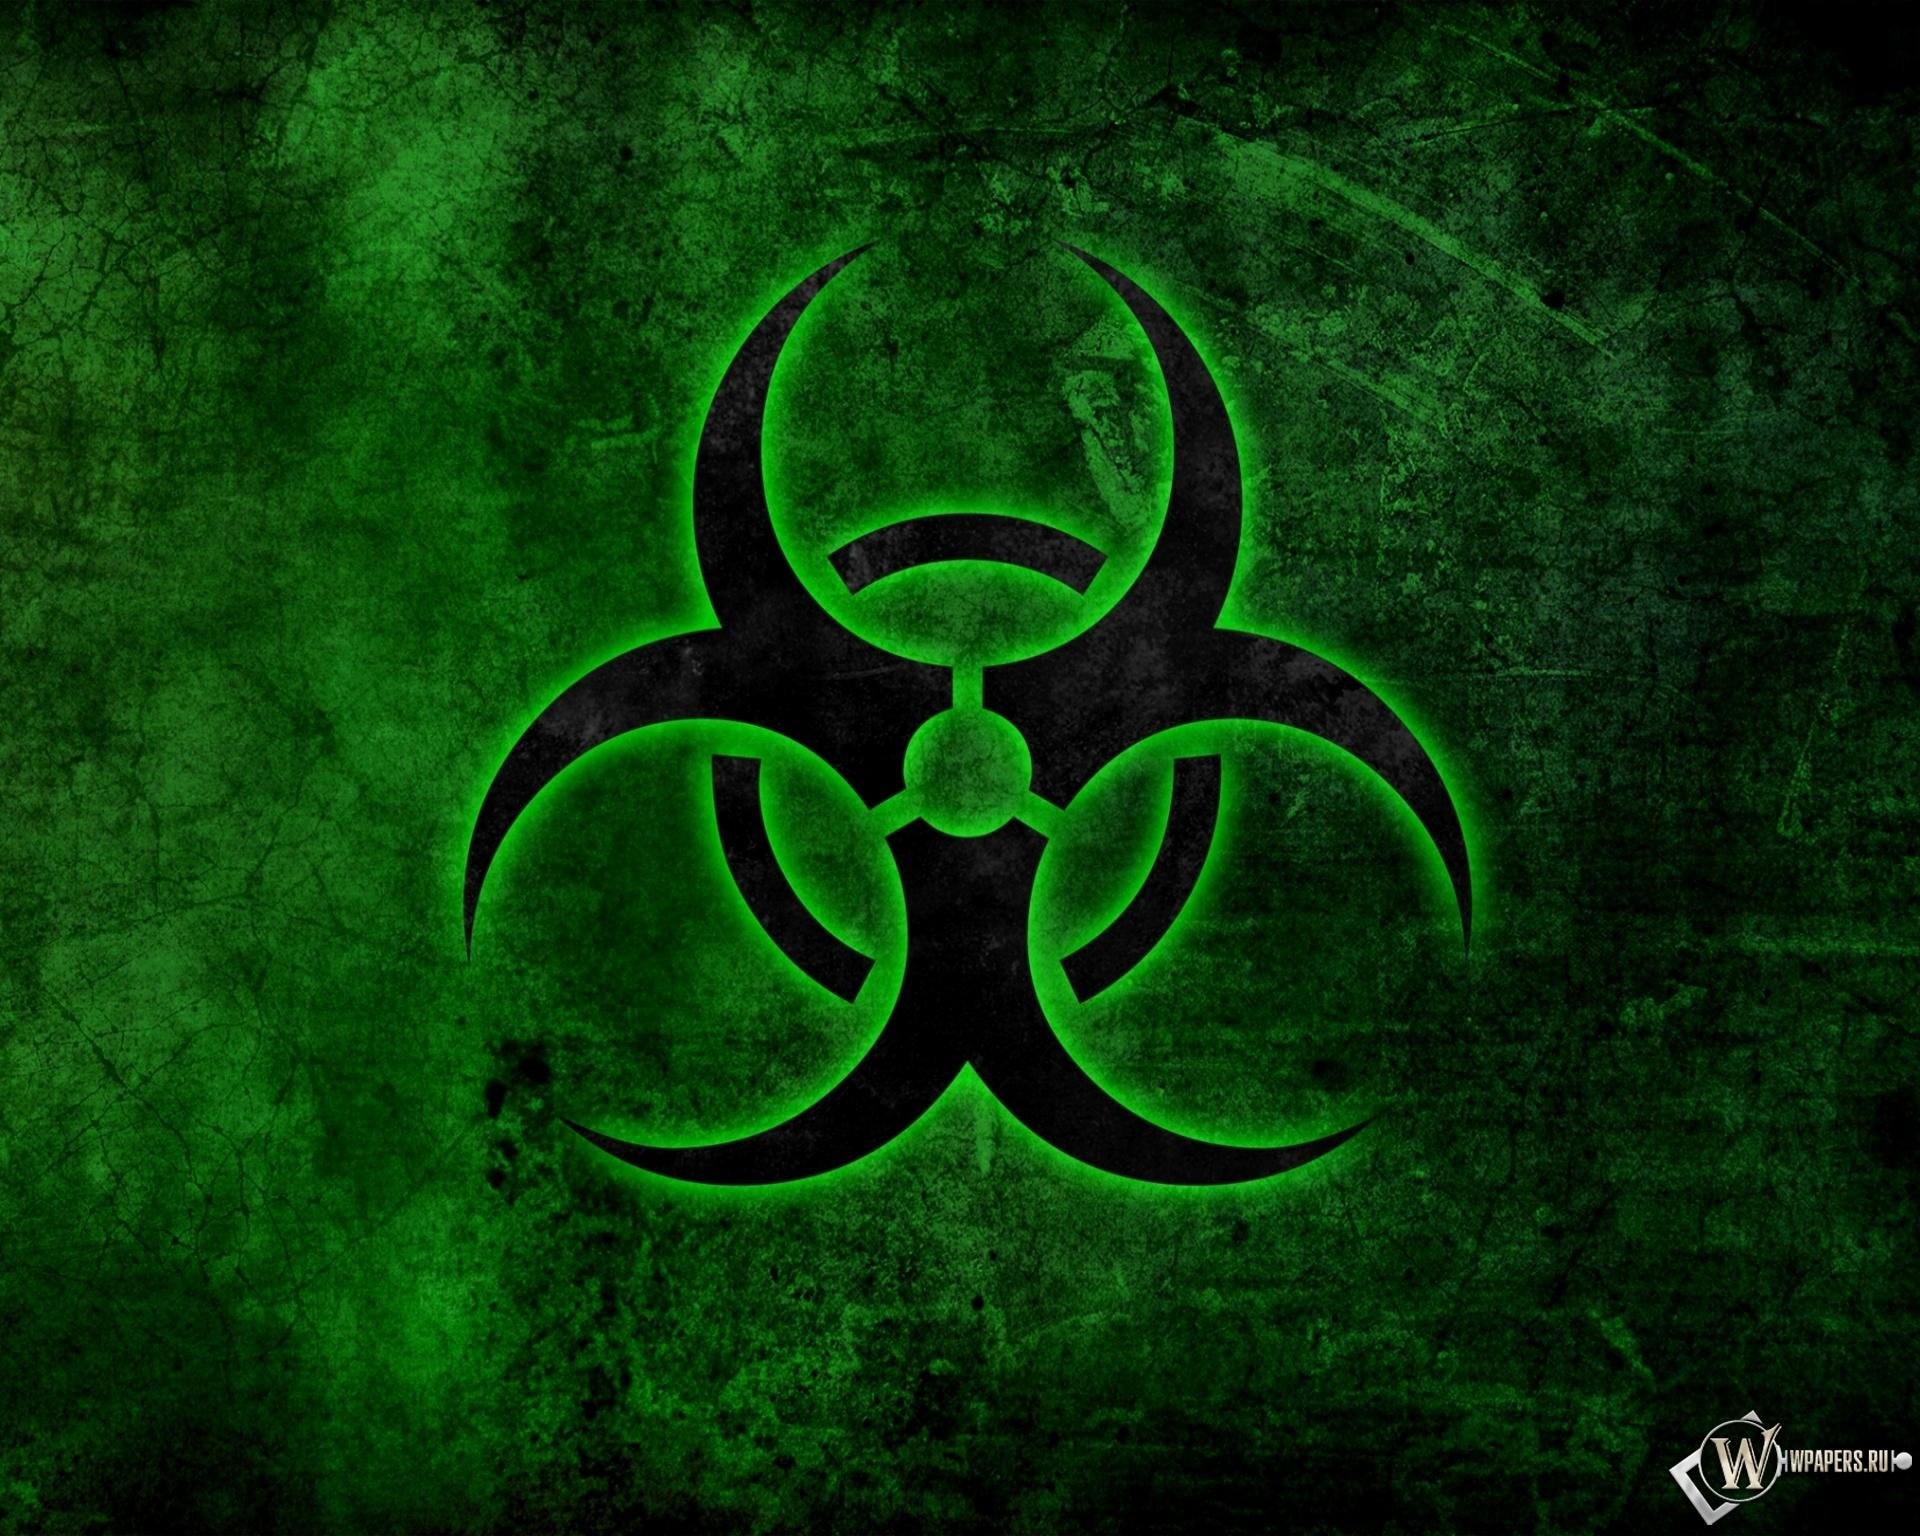 Biohazard 1920x1536